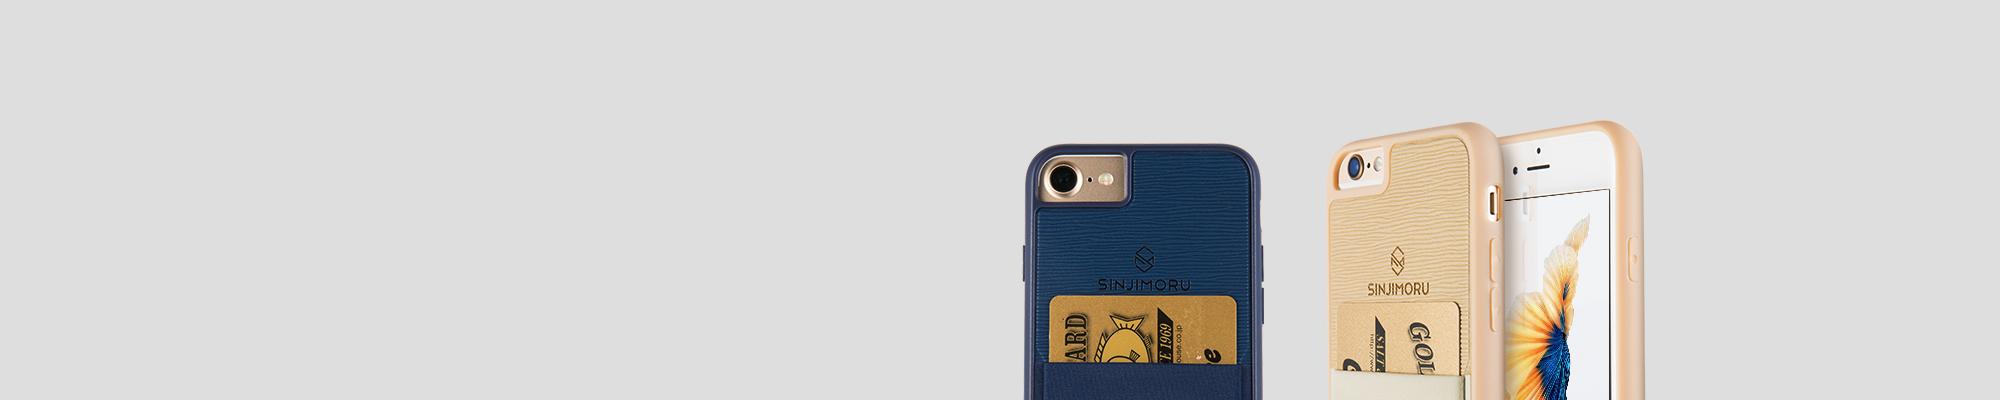 new product dc1f0 65020 Sinji Pouch Case for iphone 7 — Sinjimoru